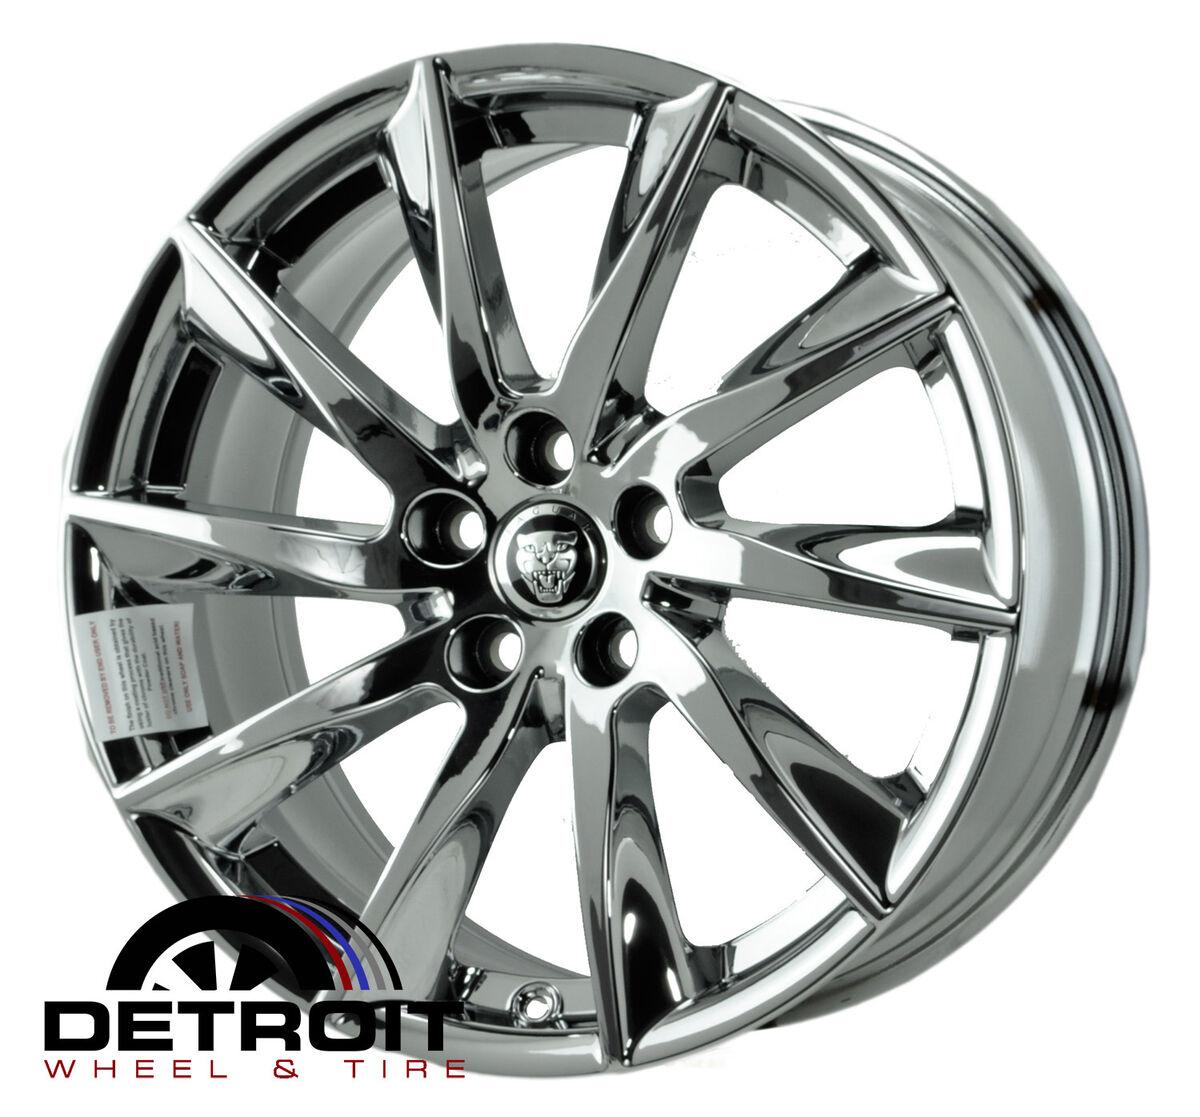 Jaguar XF PVD Bright Chrome Wheels Factory Rim 59885 Exchange 2011 2013